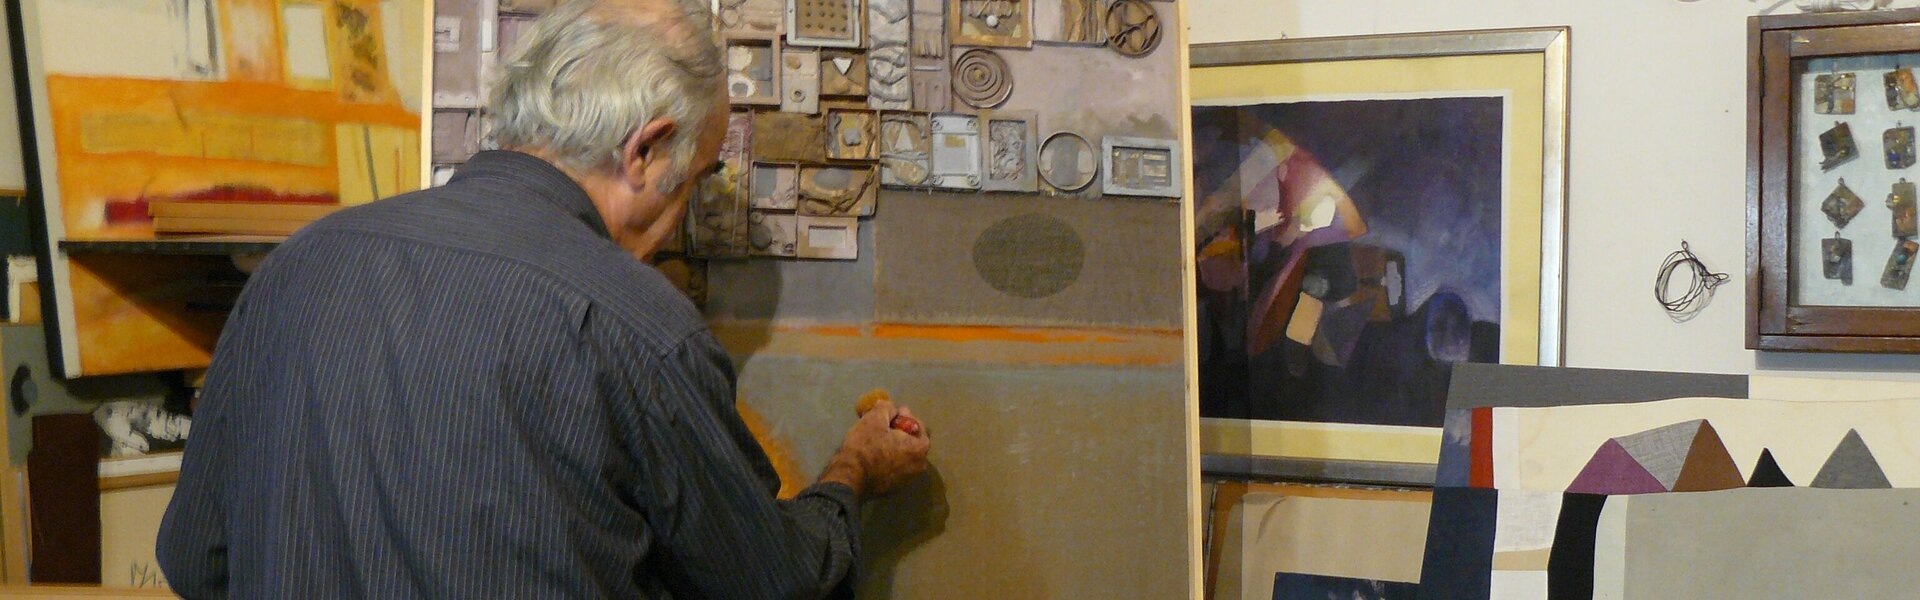 Merlino Bottega D Arte andrea massaro : contemporary italian painter, draftsman